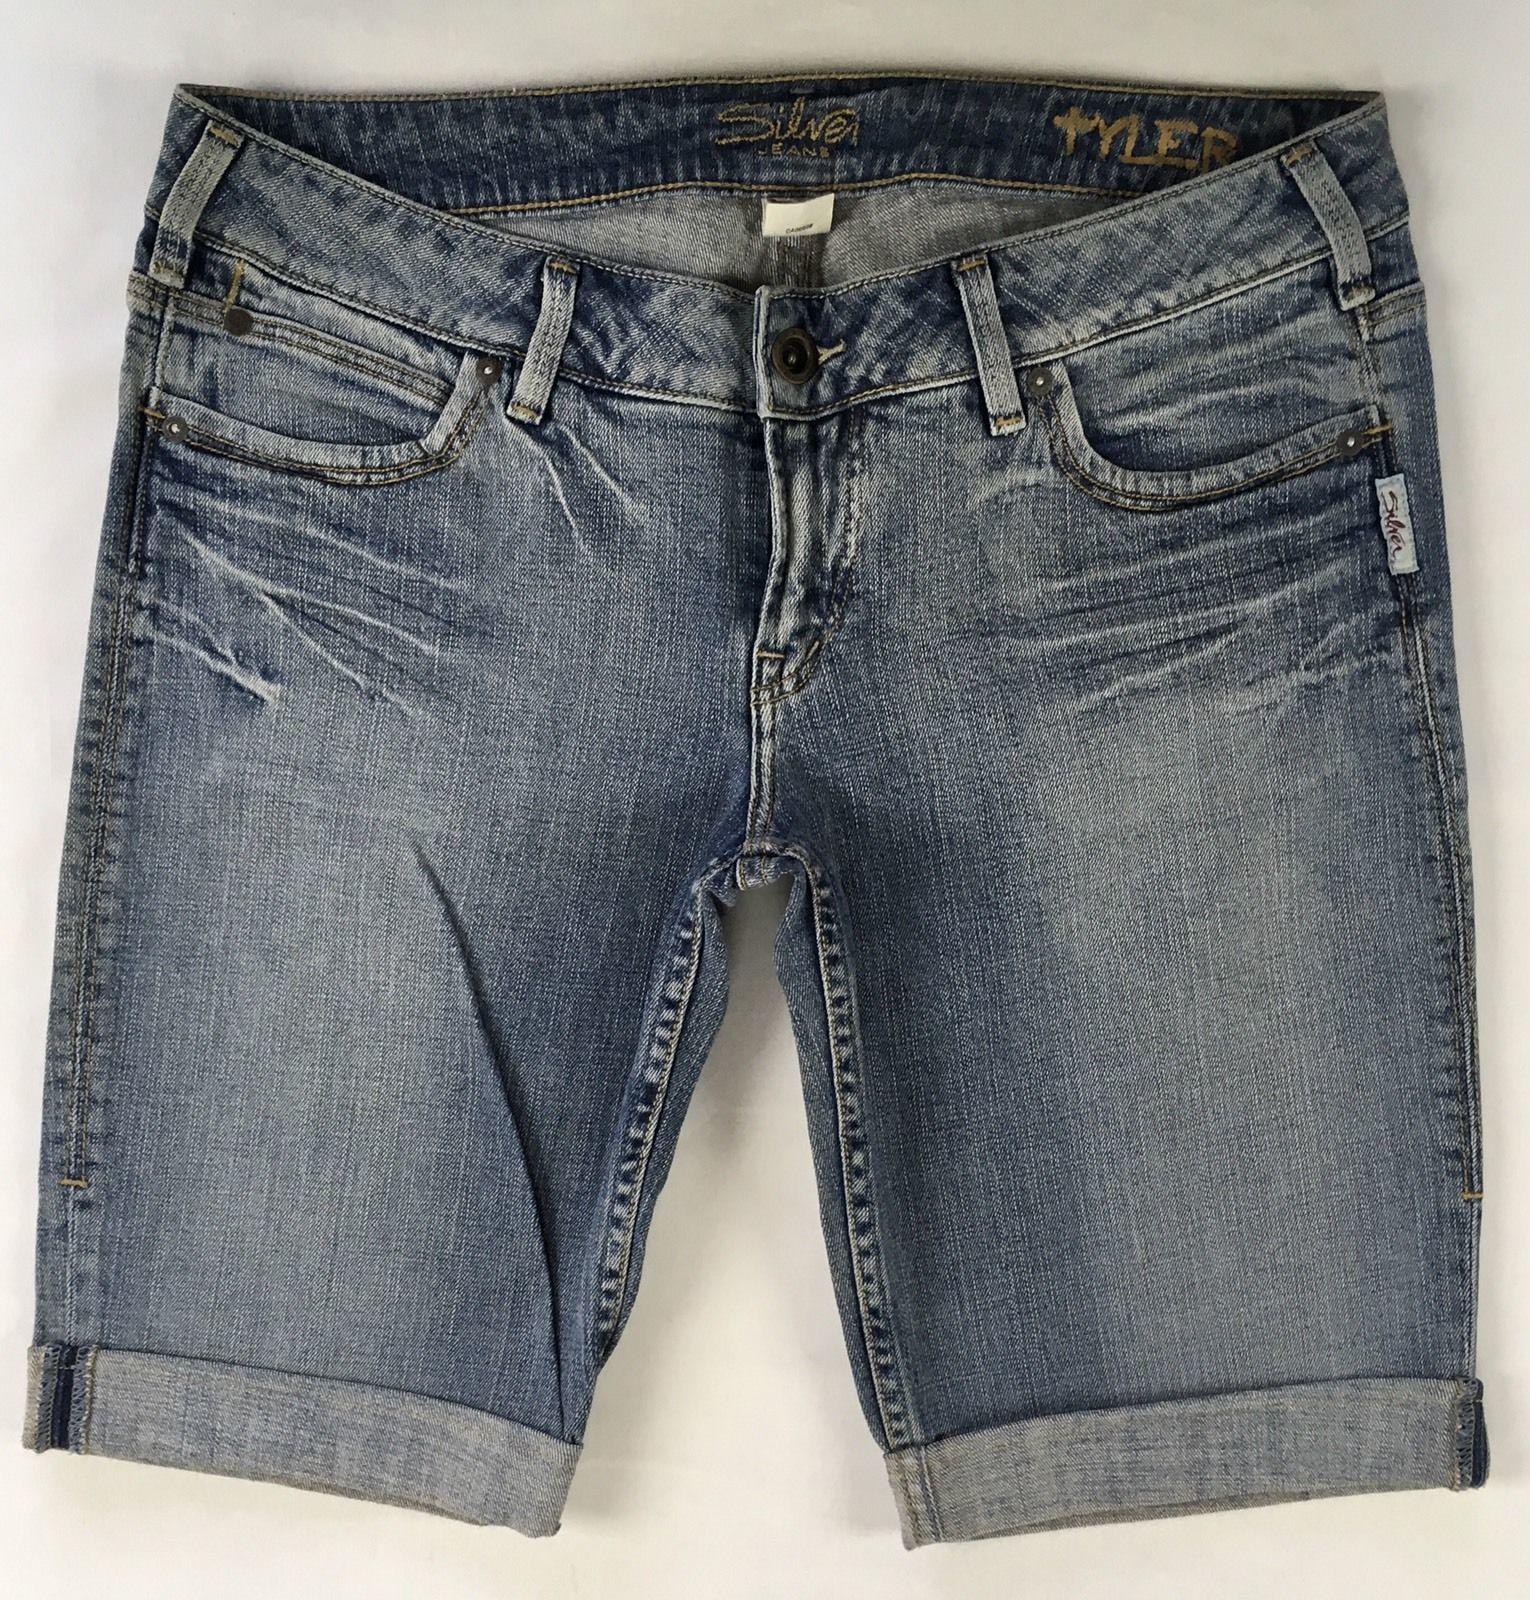 SILVER Jeans Sale Buckle Low Rise Tyler Denim Jean Stretch Bermuda Shorts 26, 32